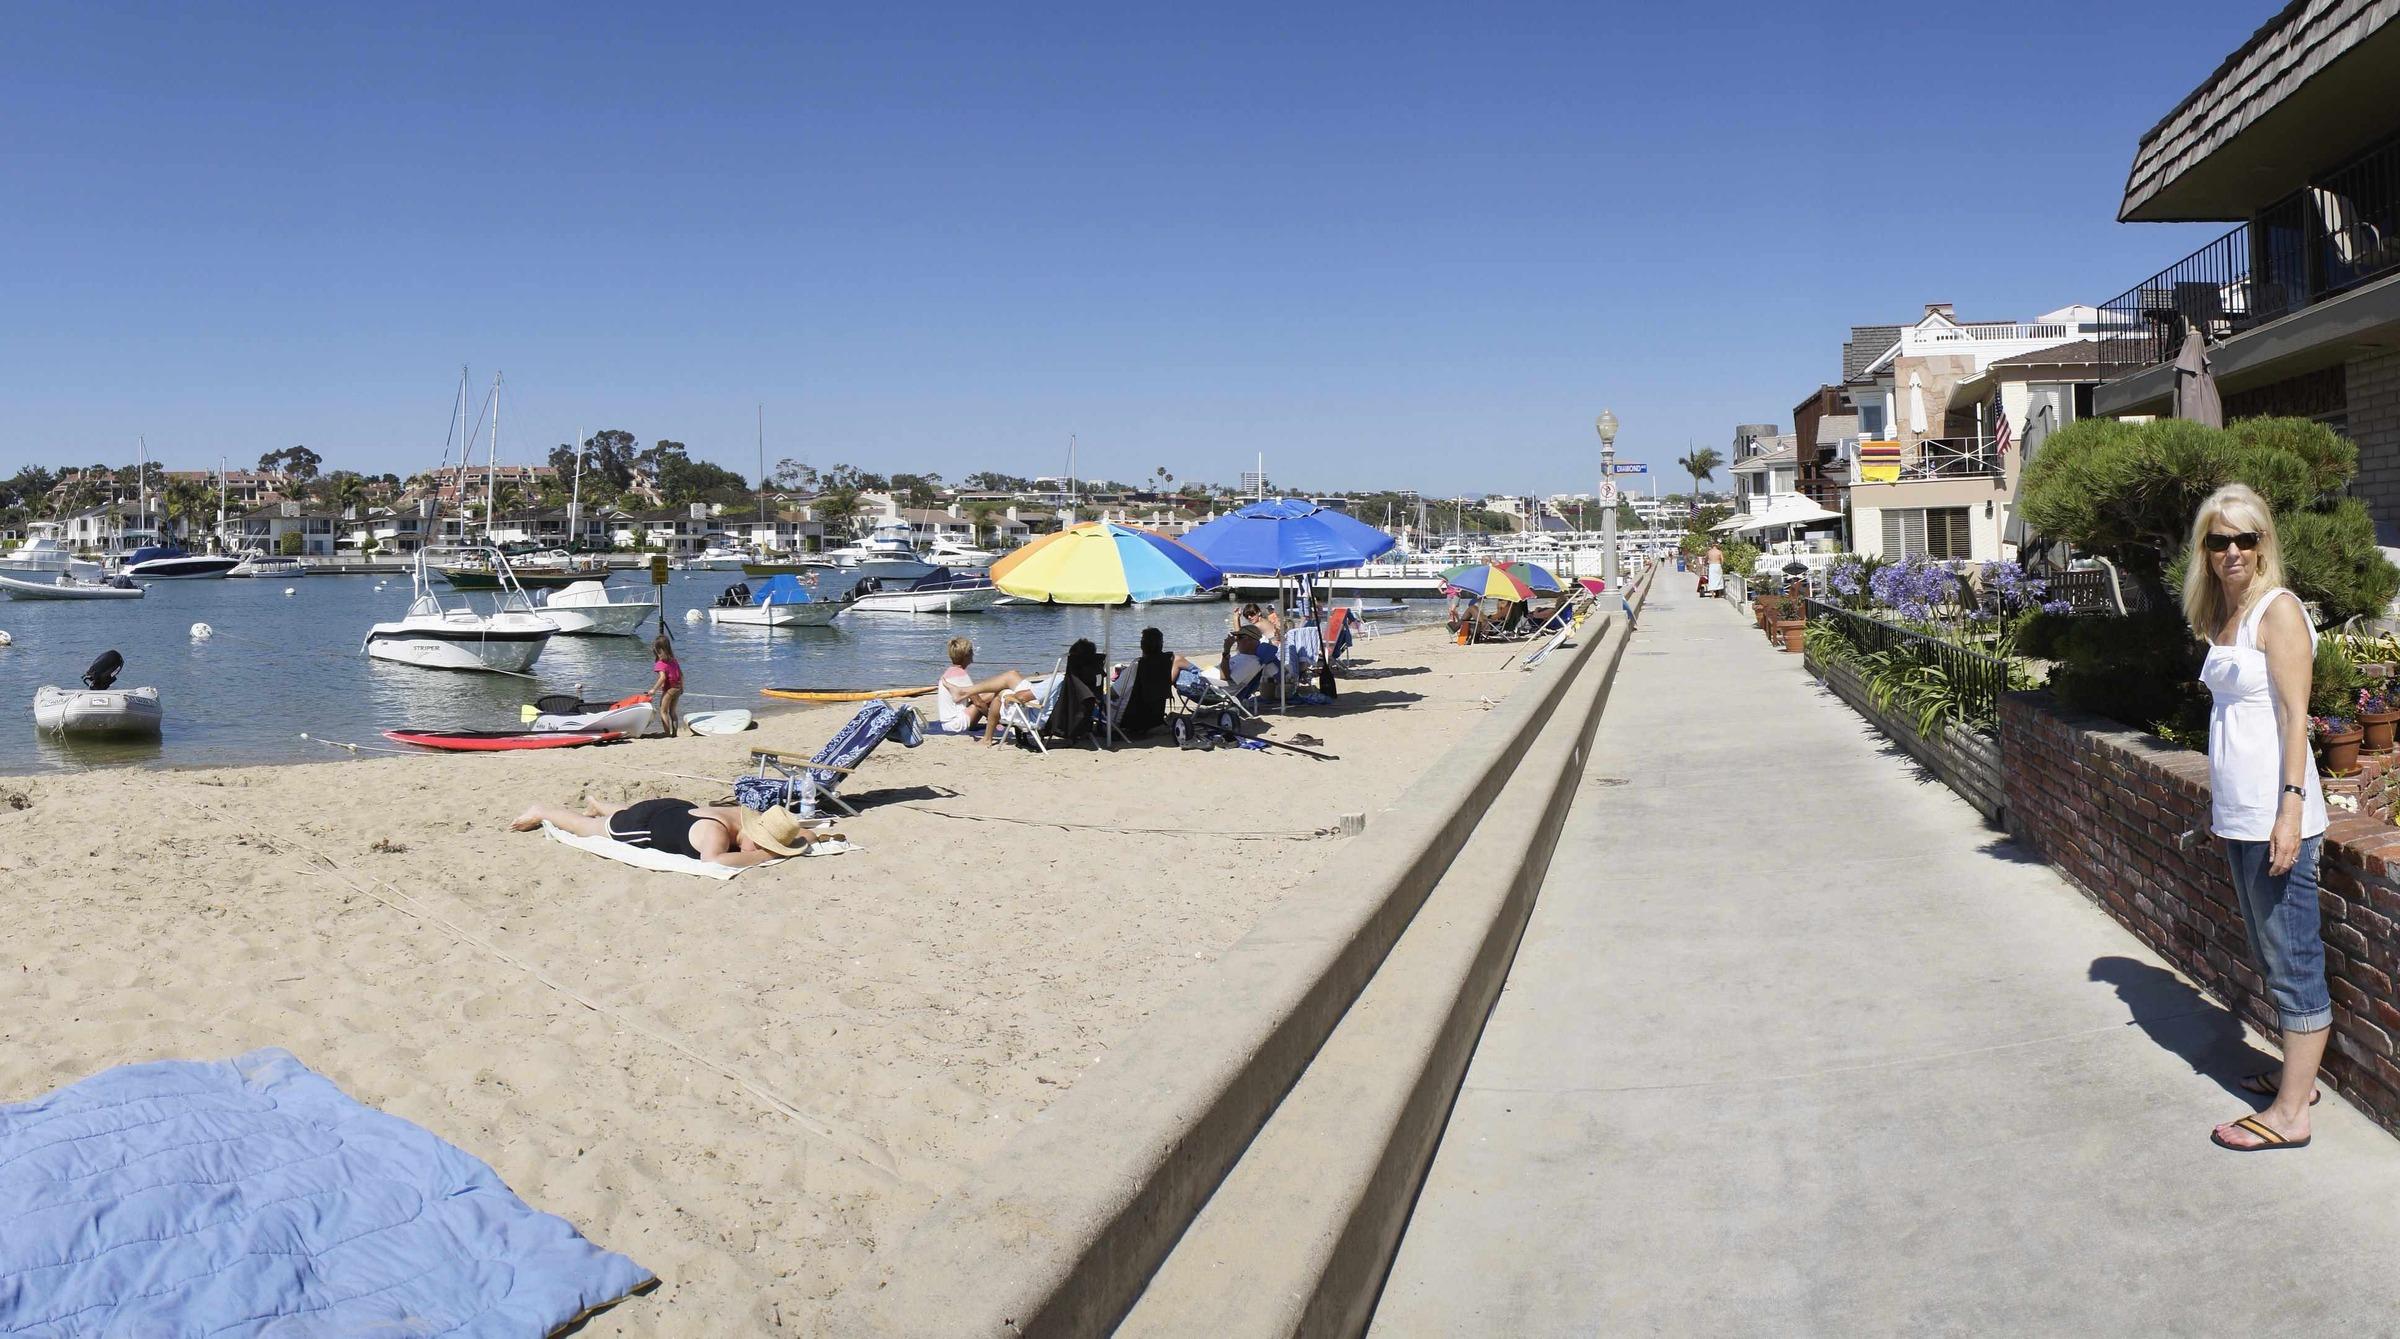 Balboa In The Summer by barjohn in barjohn